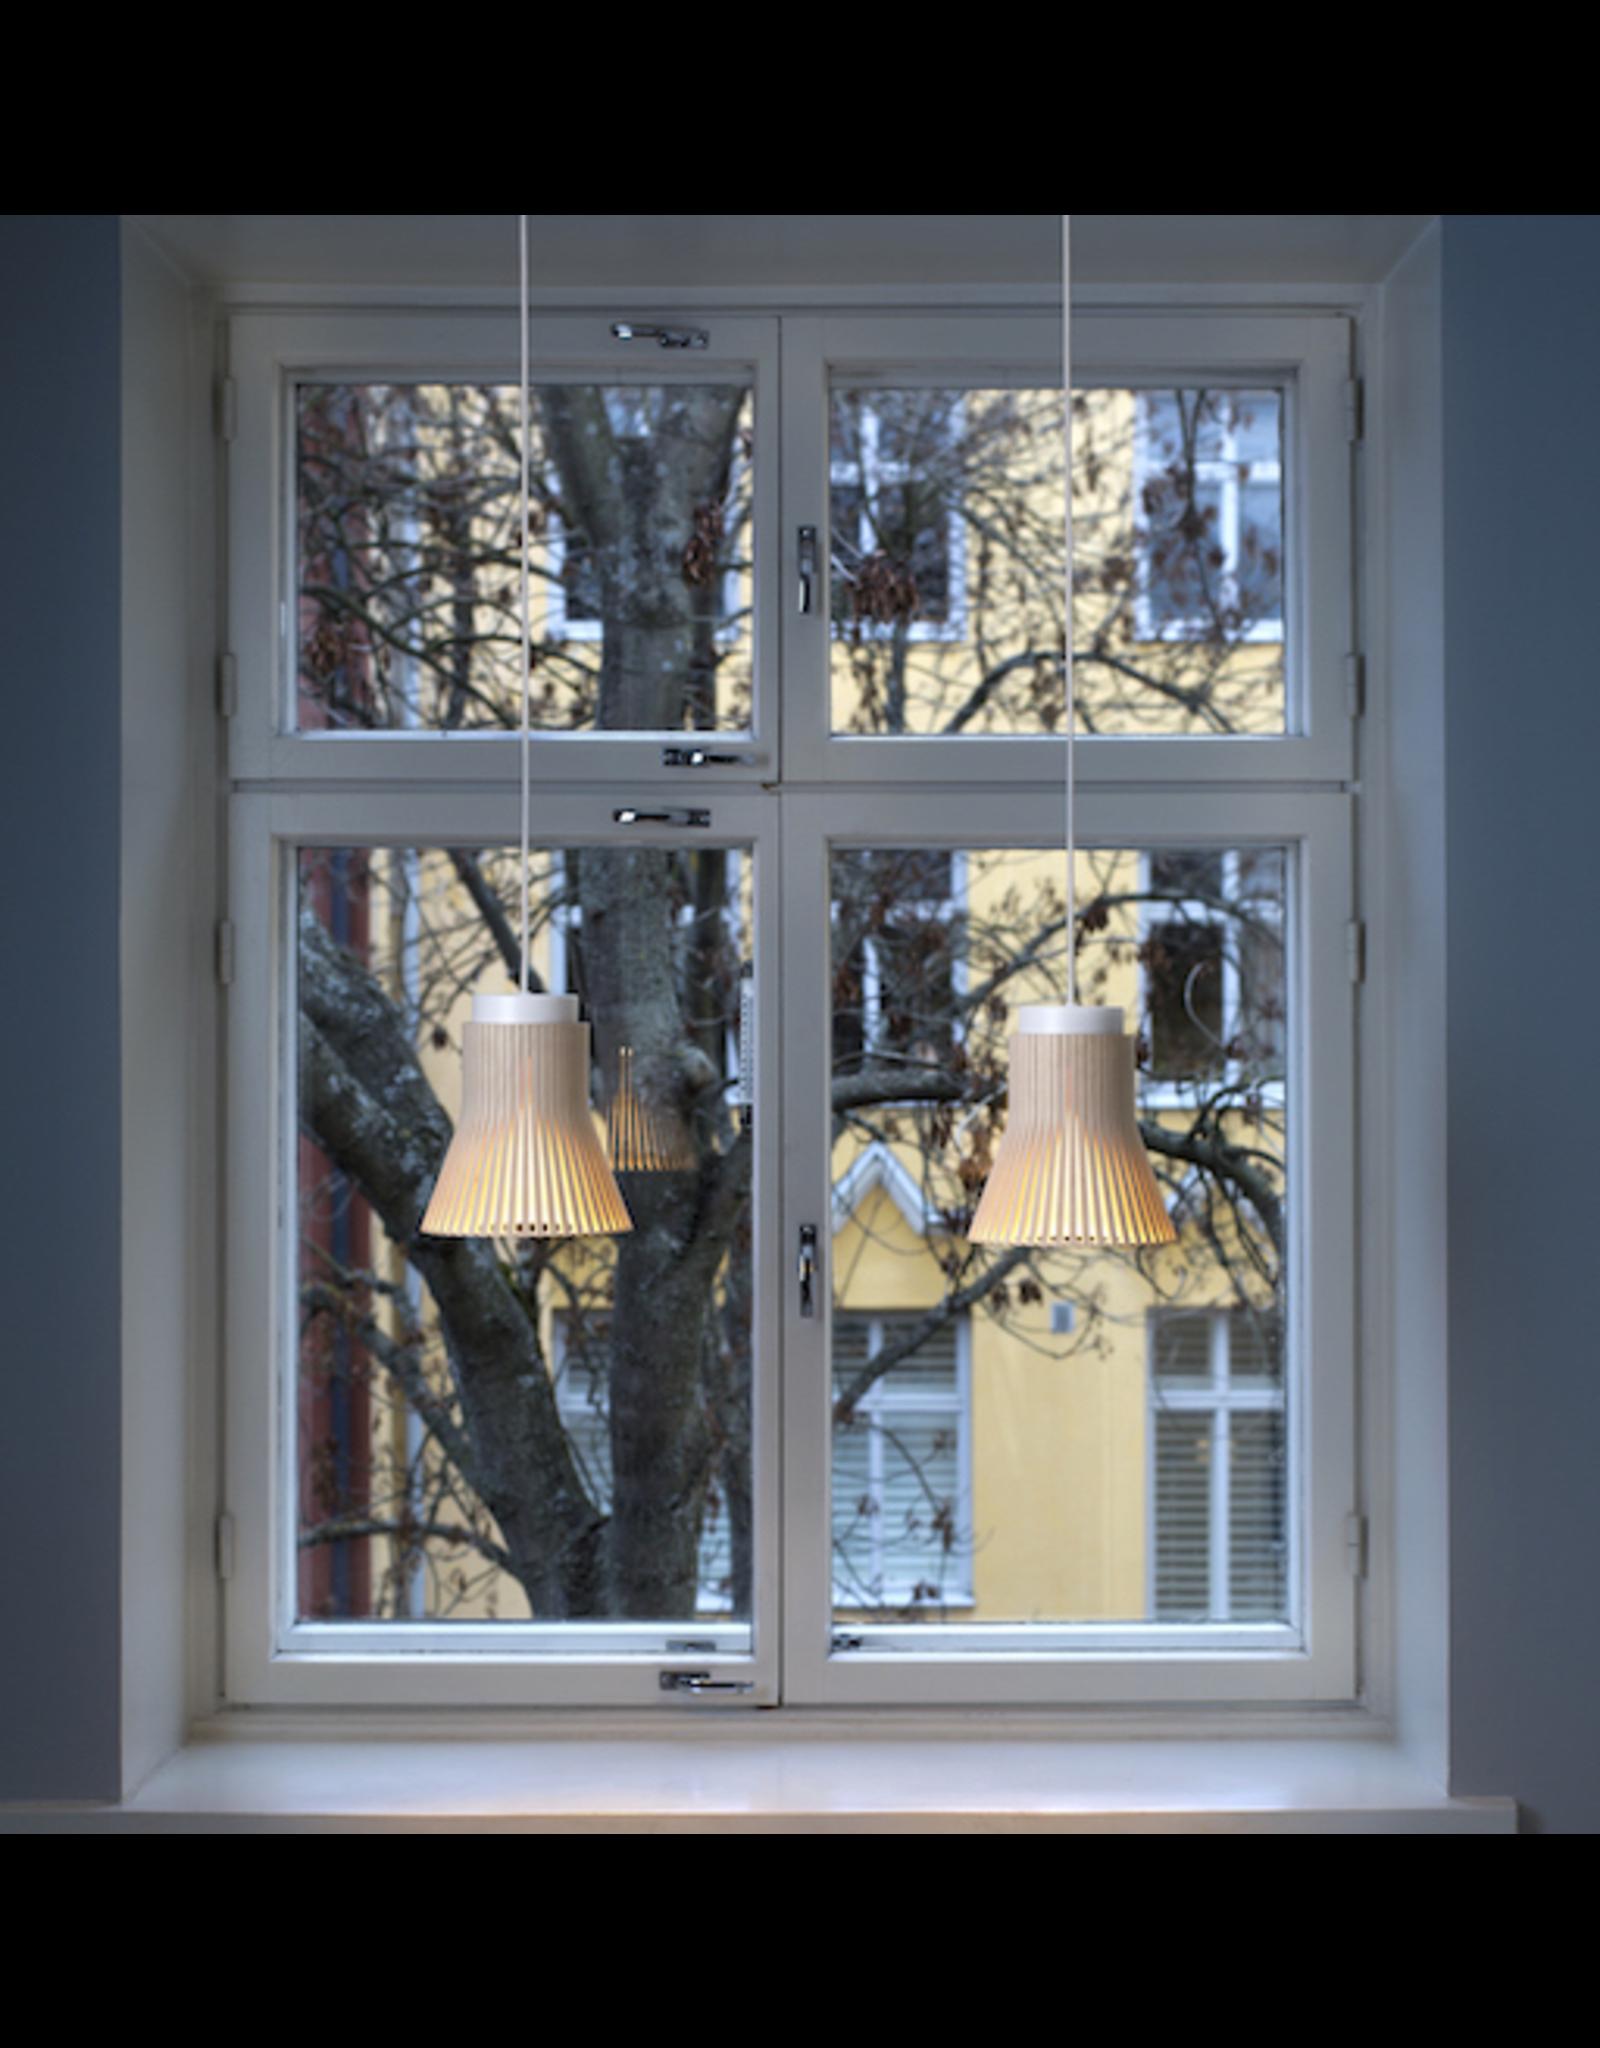 4600 PETITE PENDANT LAMP IN WALNUT VENEER